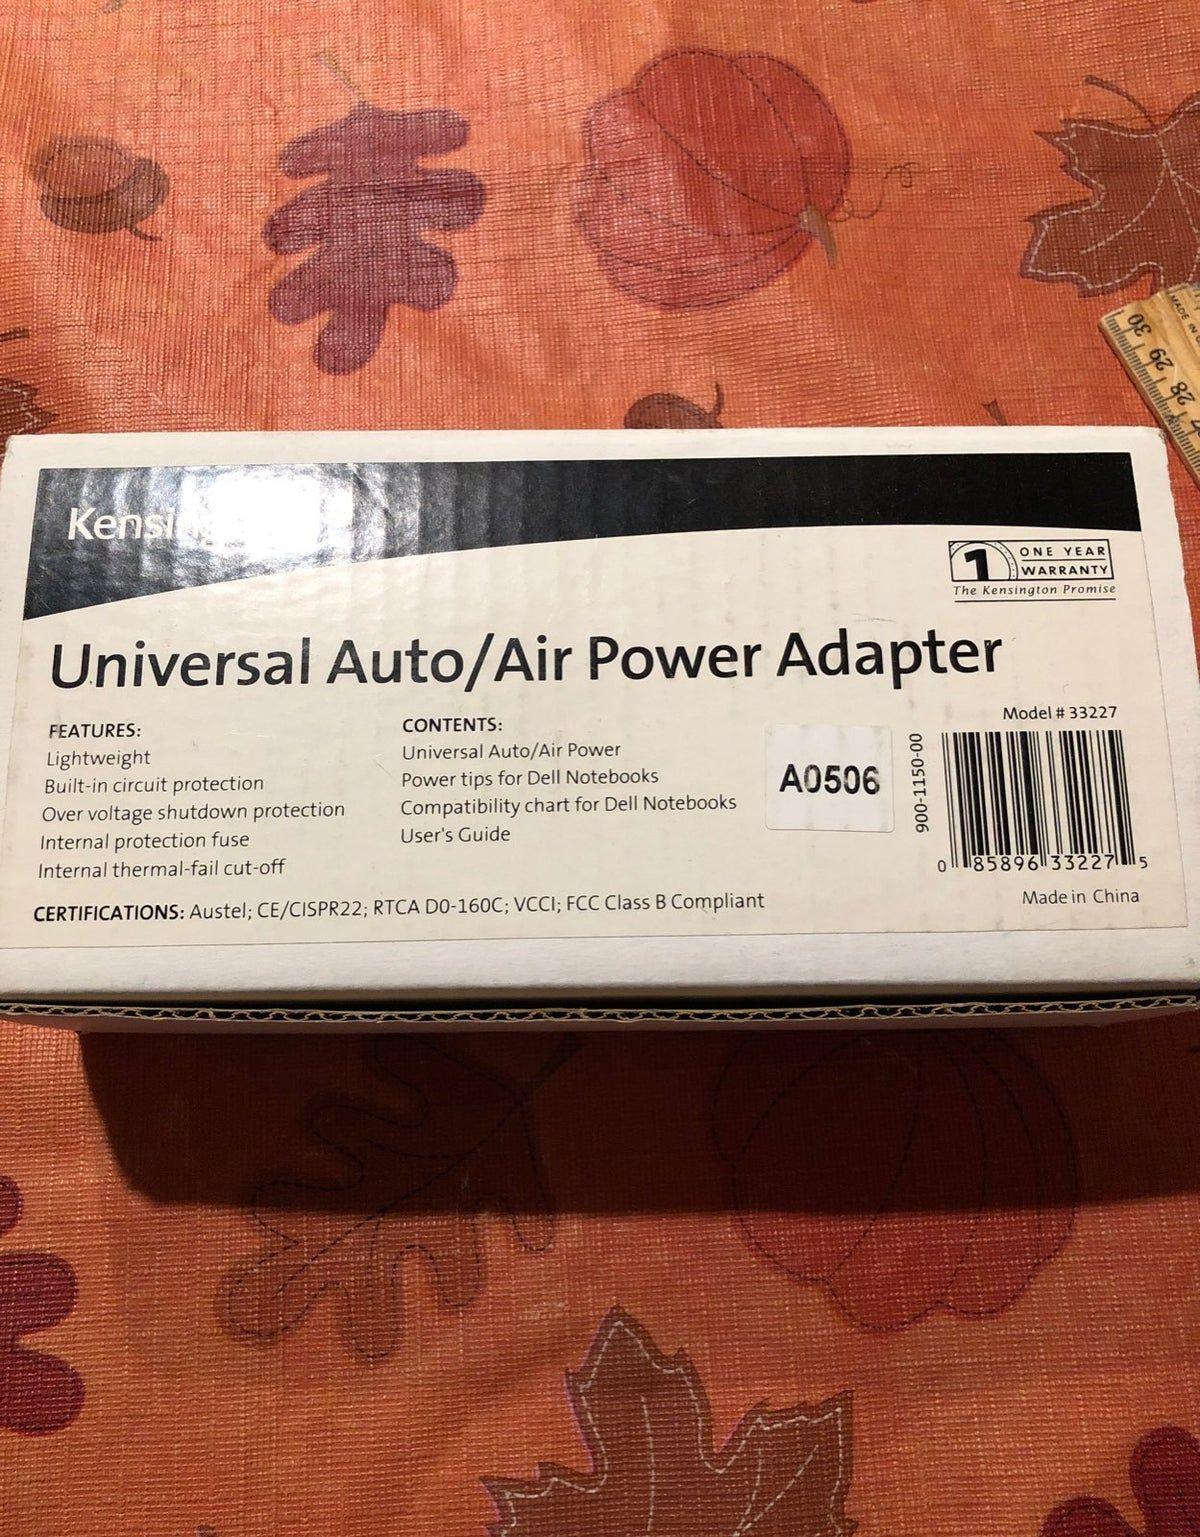 Universal Auto/Air Power Adapter